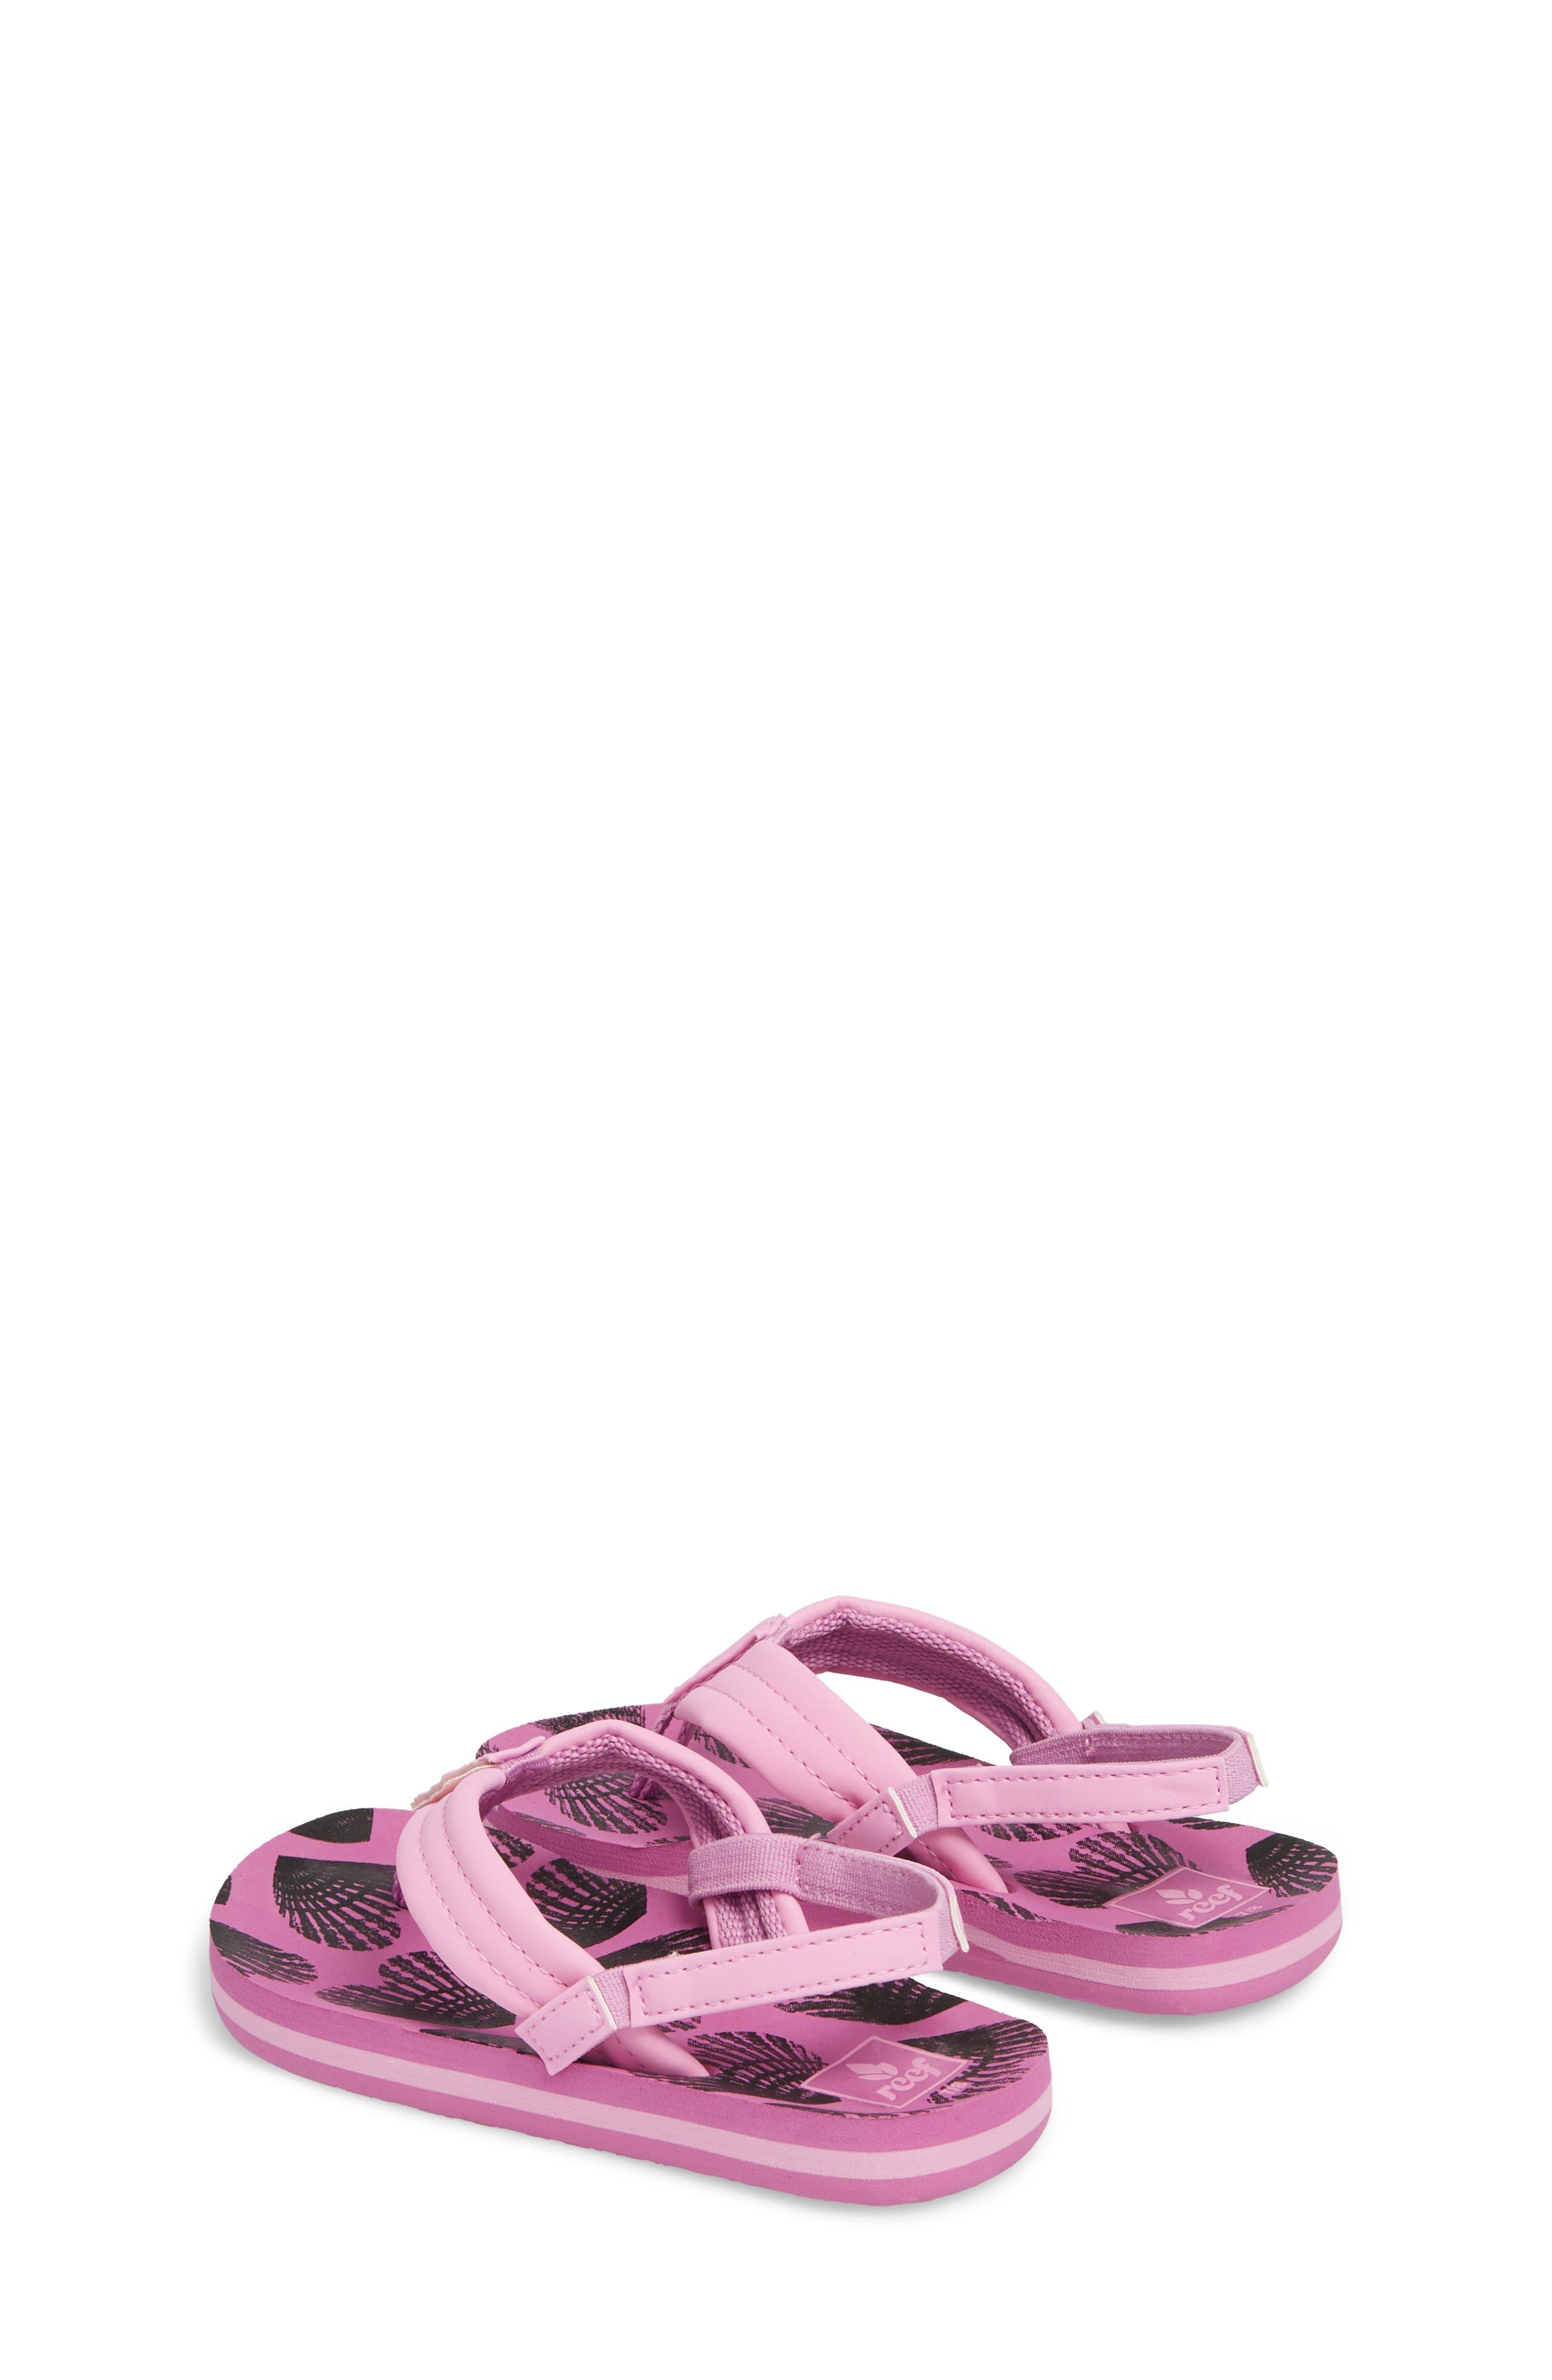 Little Ahi Sandal,                             Alternate thumbnail 2, color,                             Purple